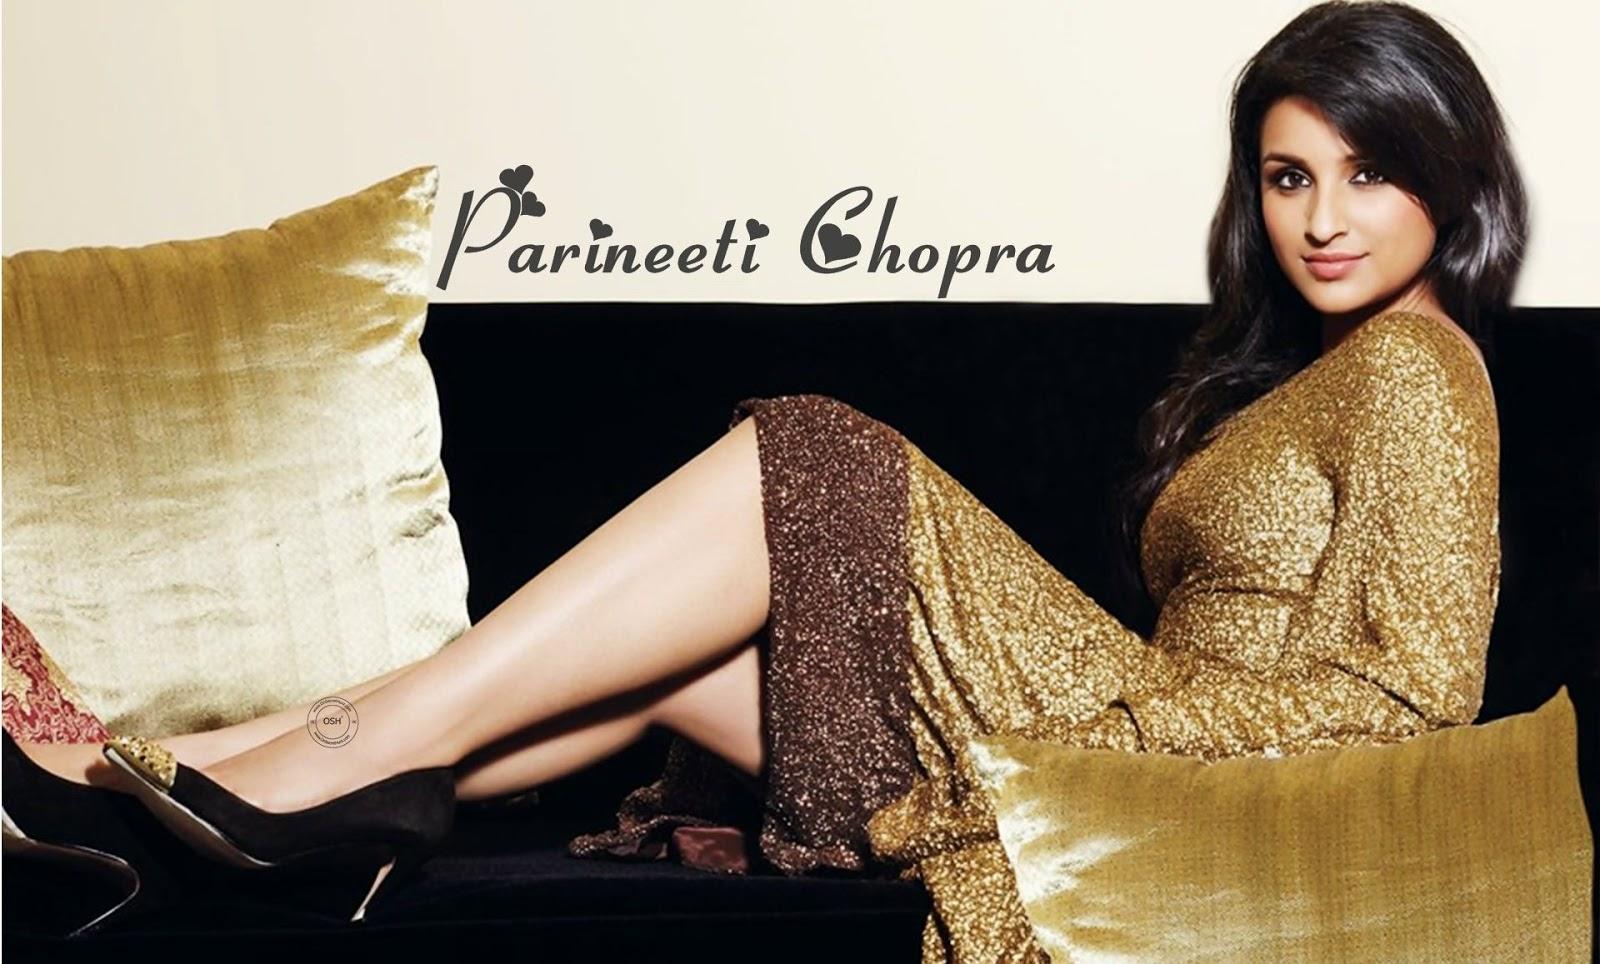 parineeti chopra hd wallpapers desktop